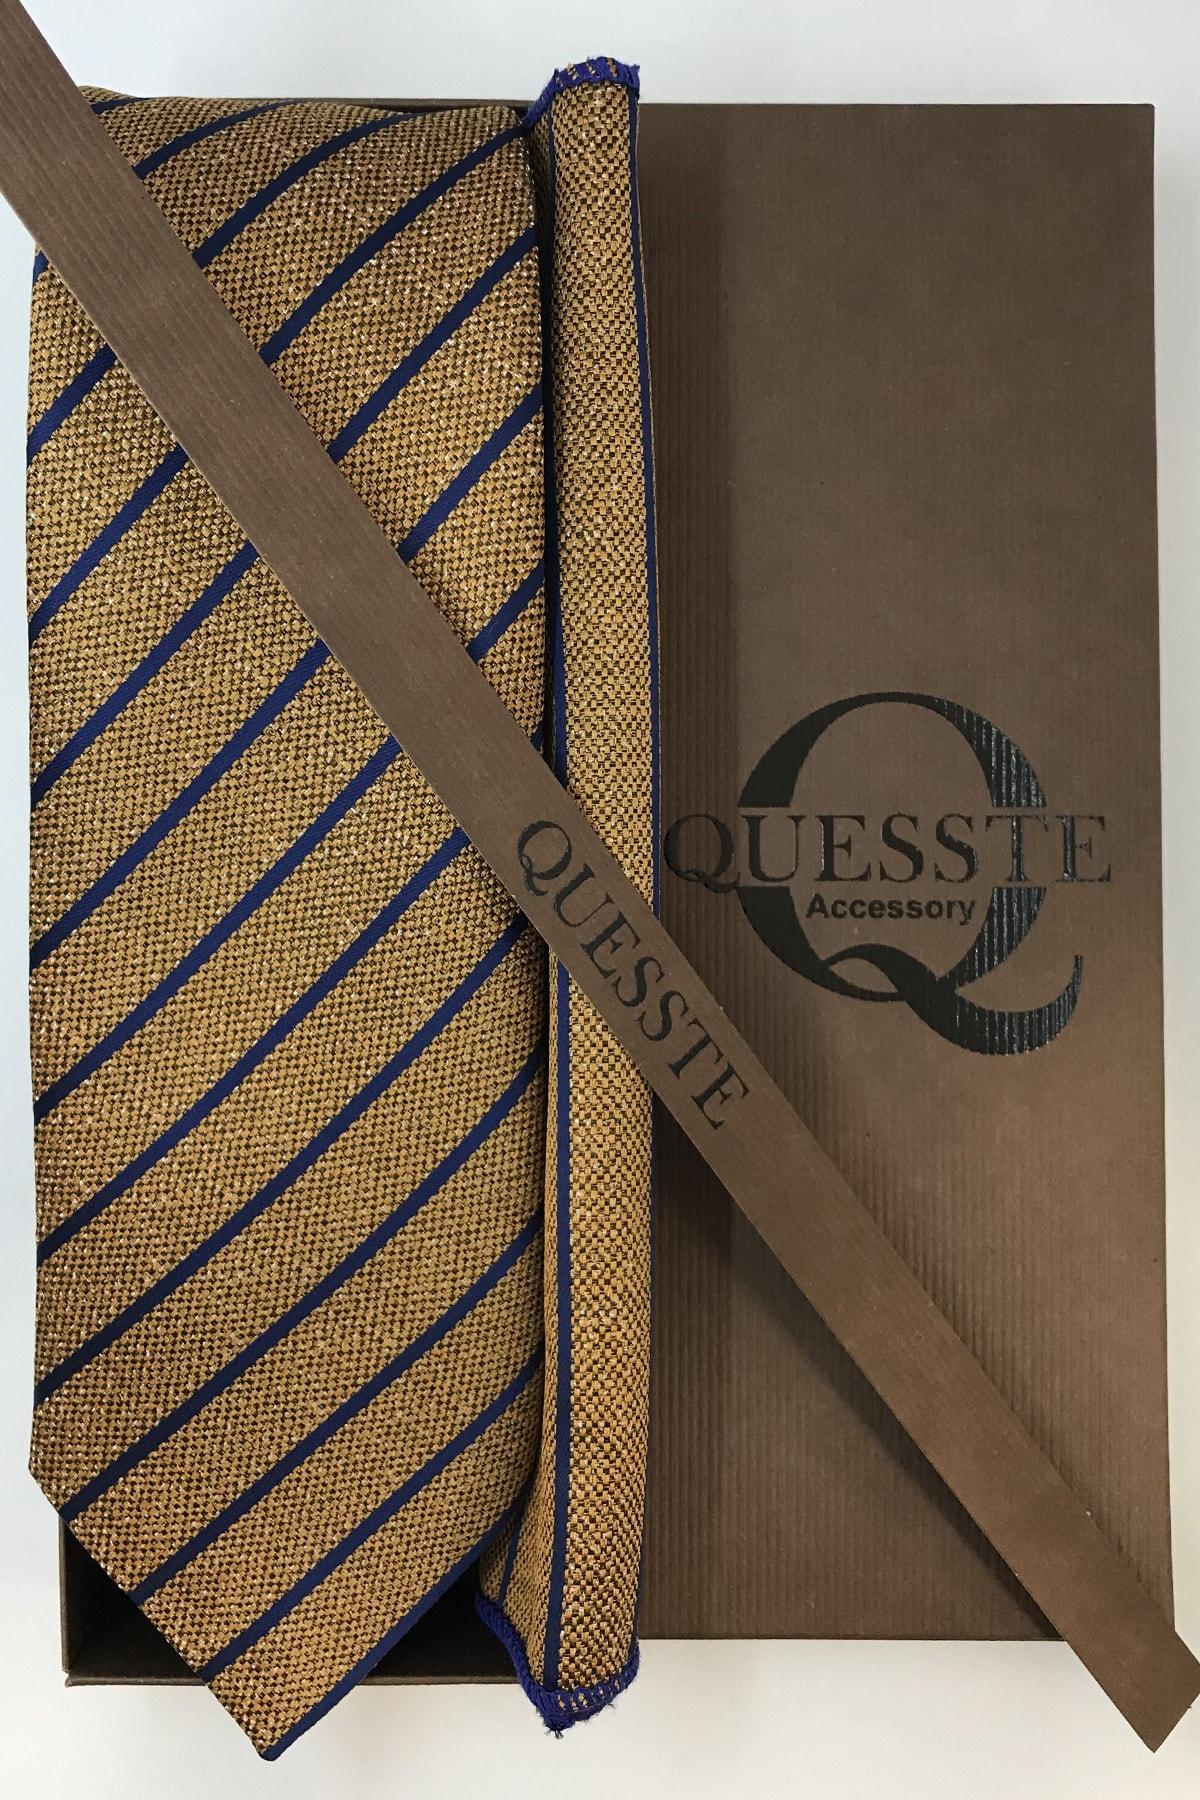 Quesste Accessory Erkek Gold Lacivert Çizgi Desenli Kravat Mendil Kutulu Set 2